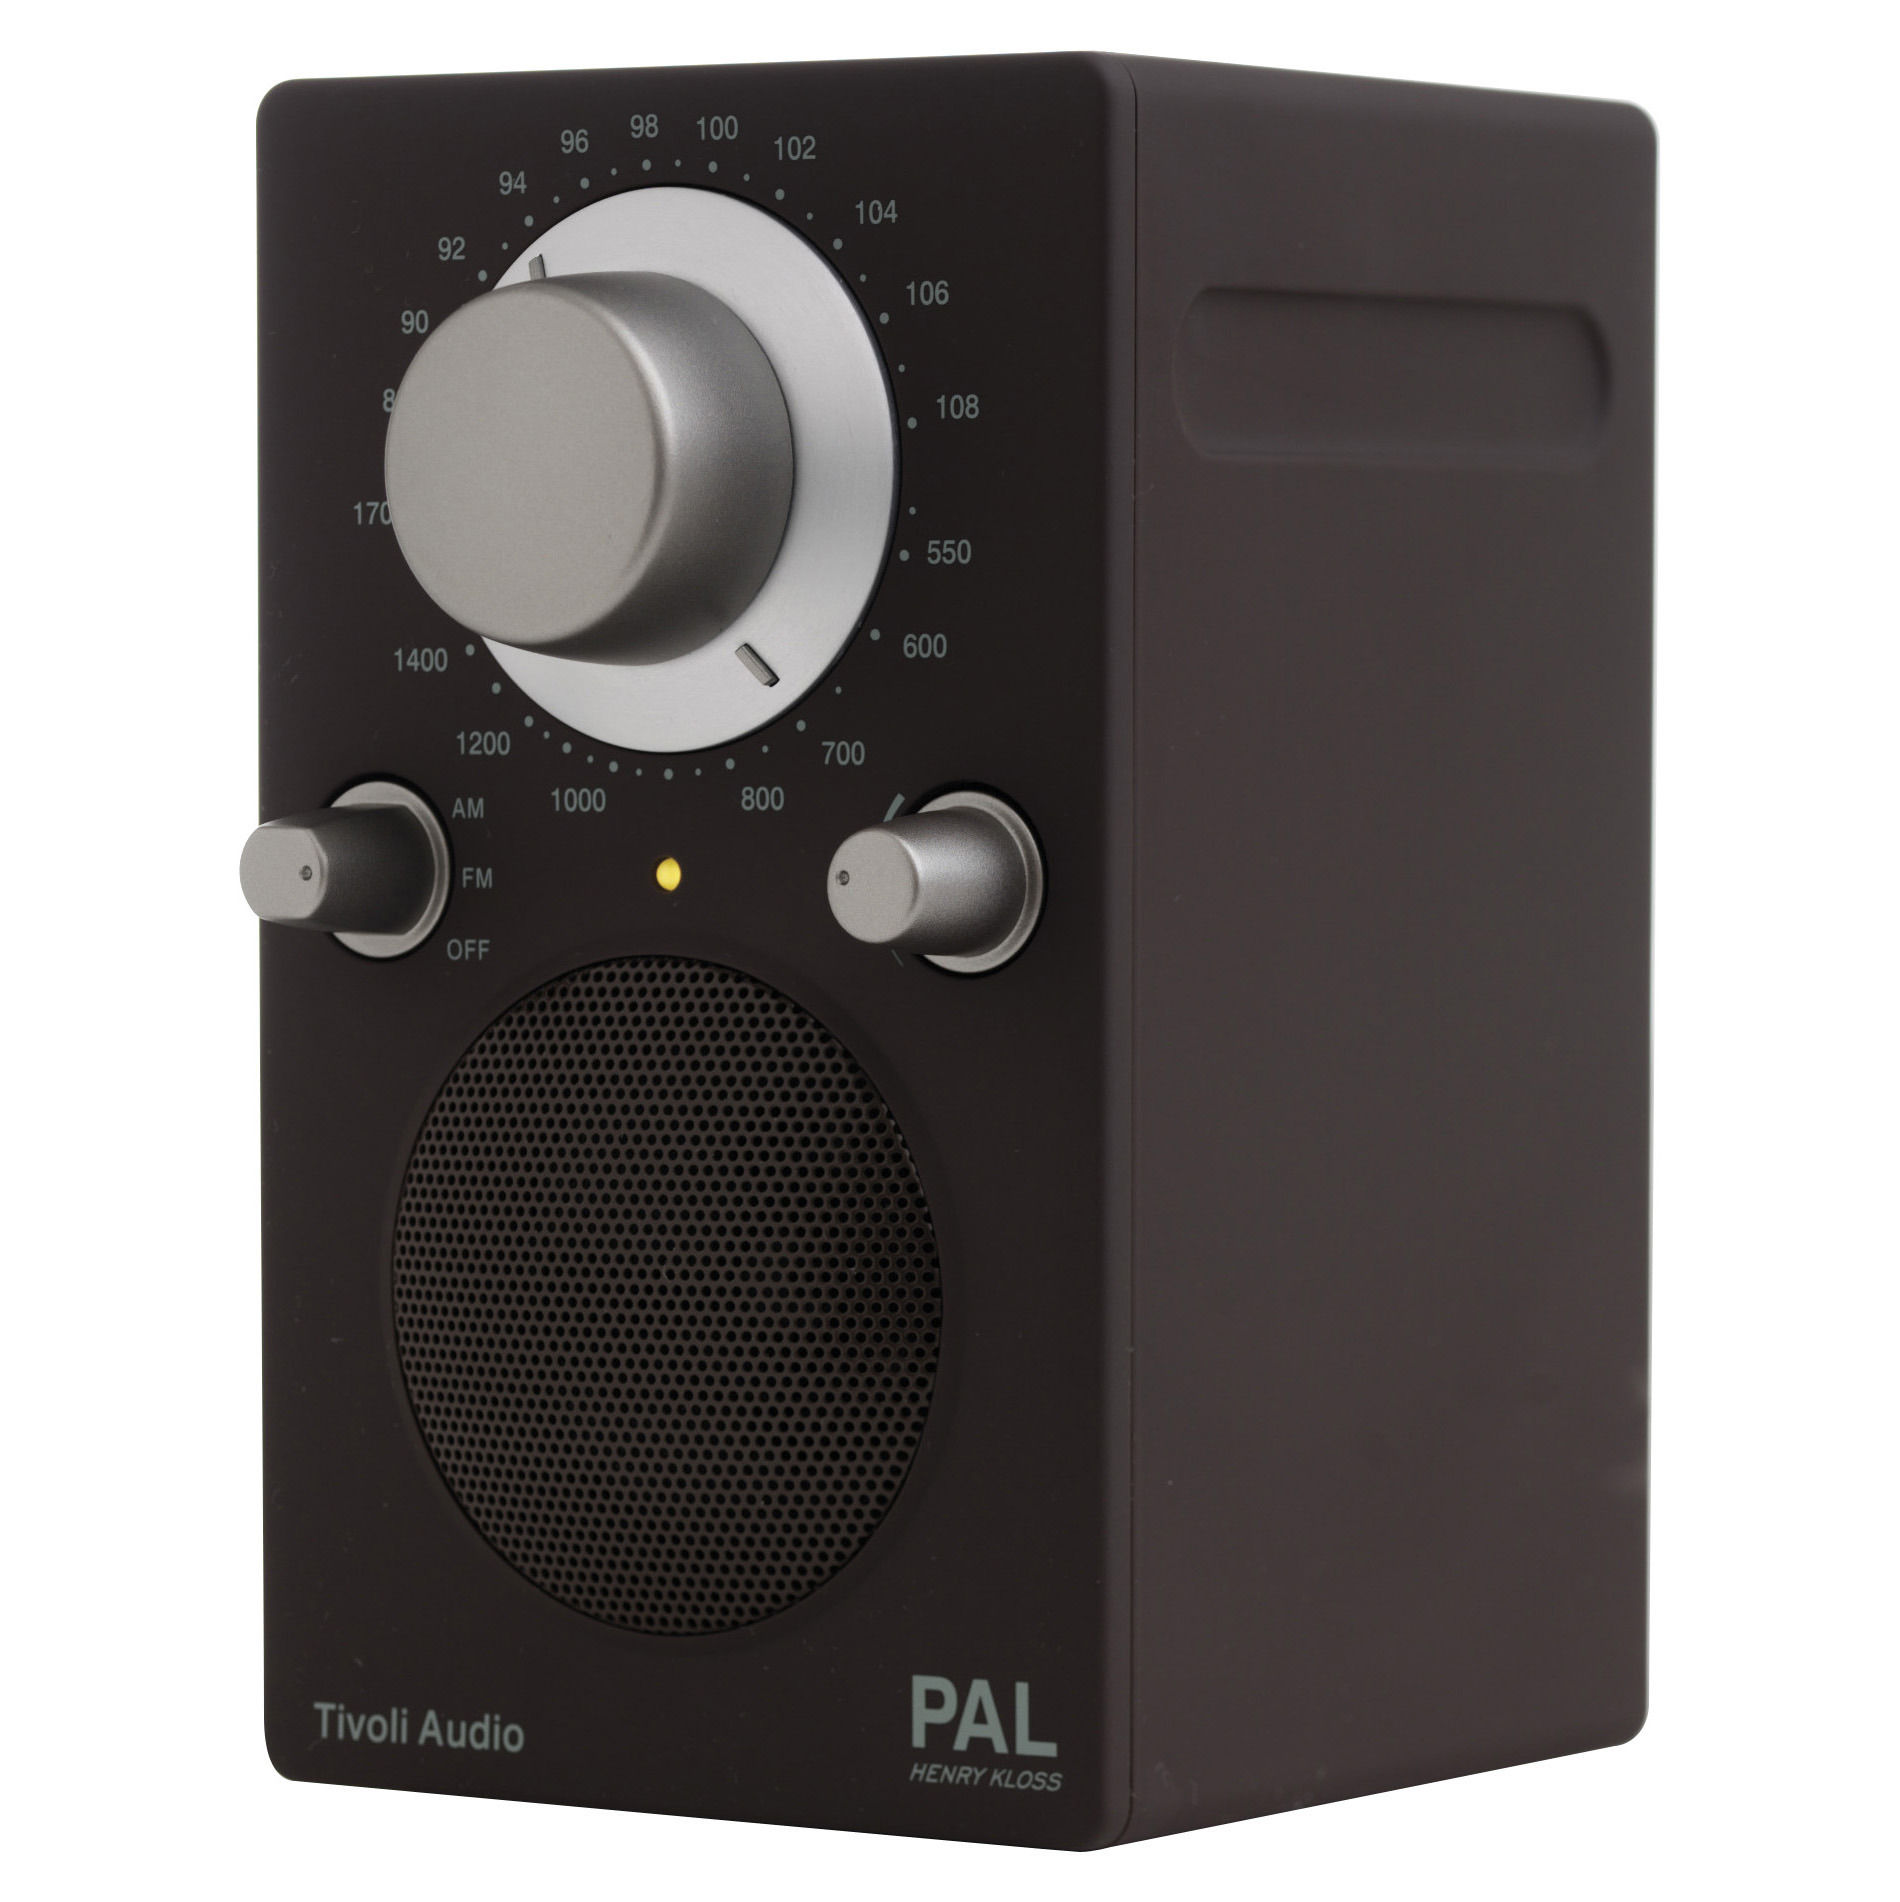 radio pal enceinte portative marron tivoli audio. Black Bedroom Furniture Sets. Home Design Ideas